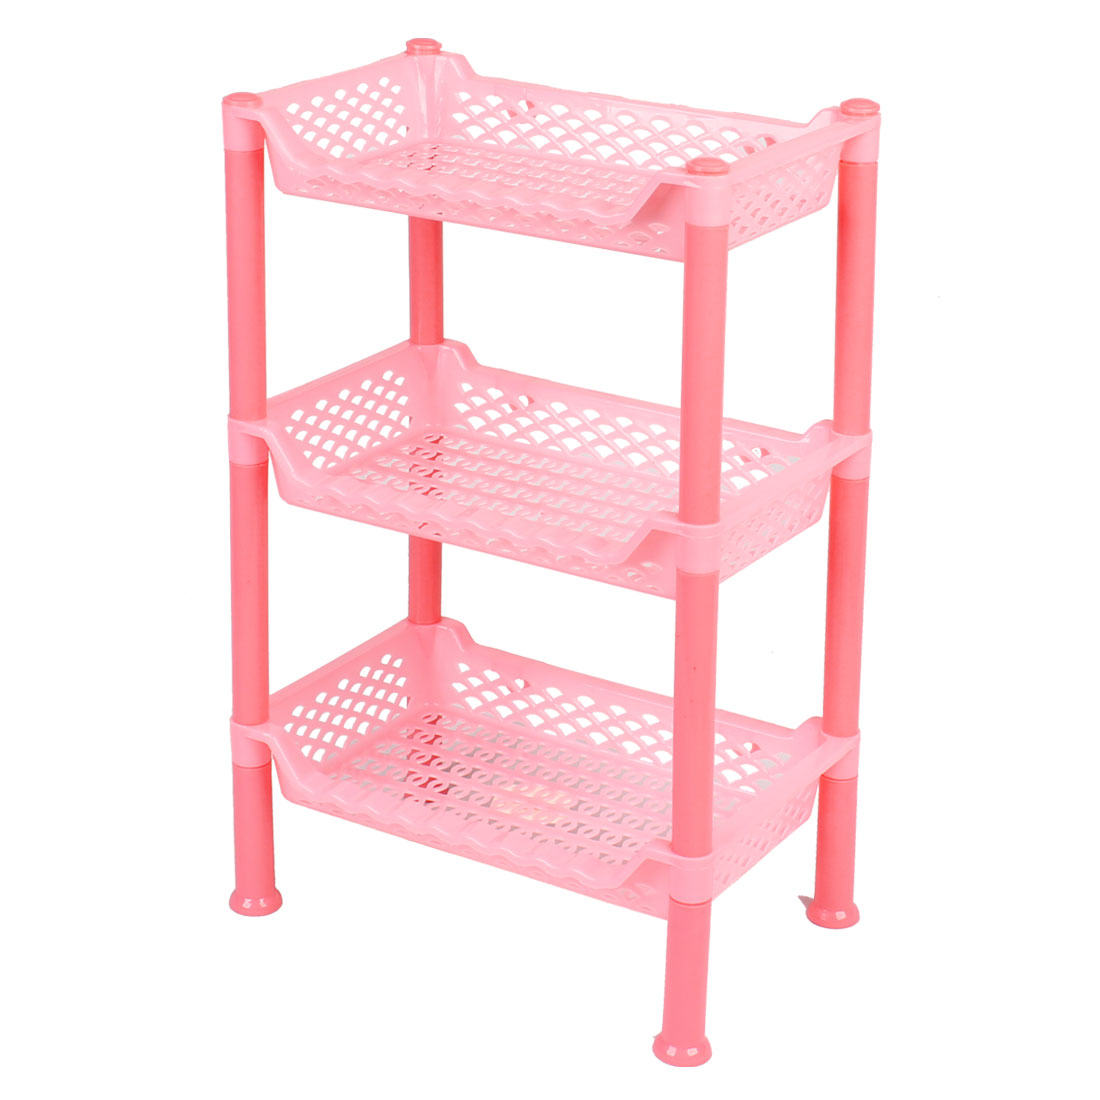 Household Rectangular Pink Plastic 3 Layers Shelf Storage Rack Organizer